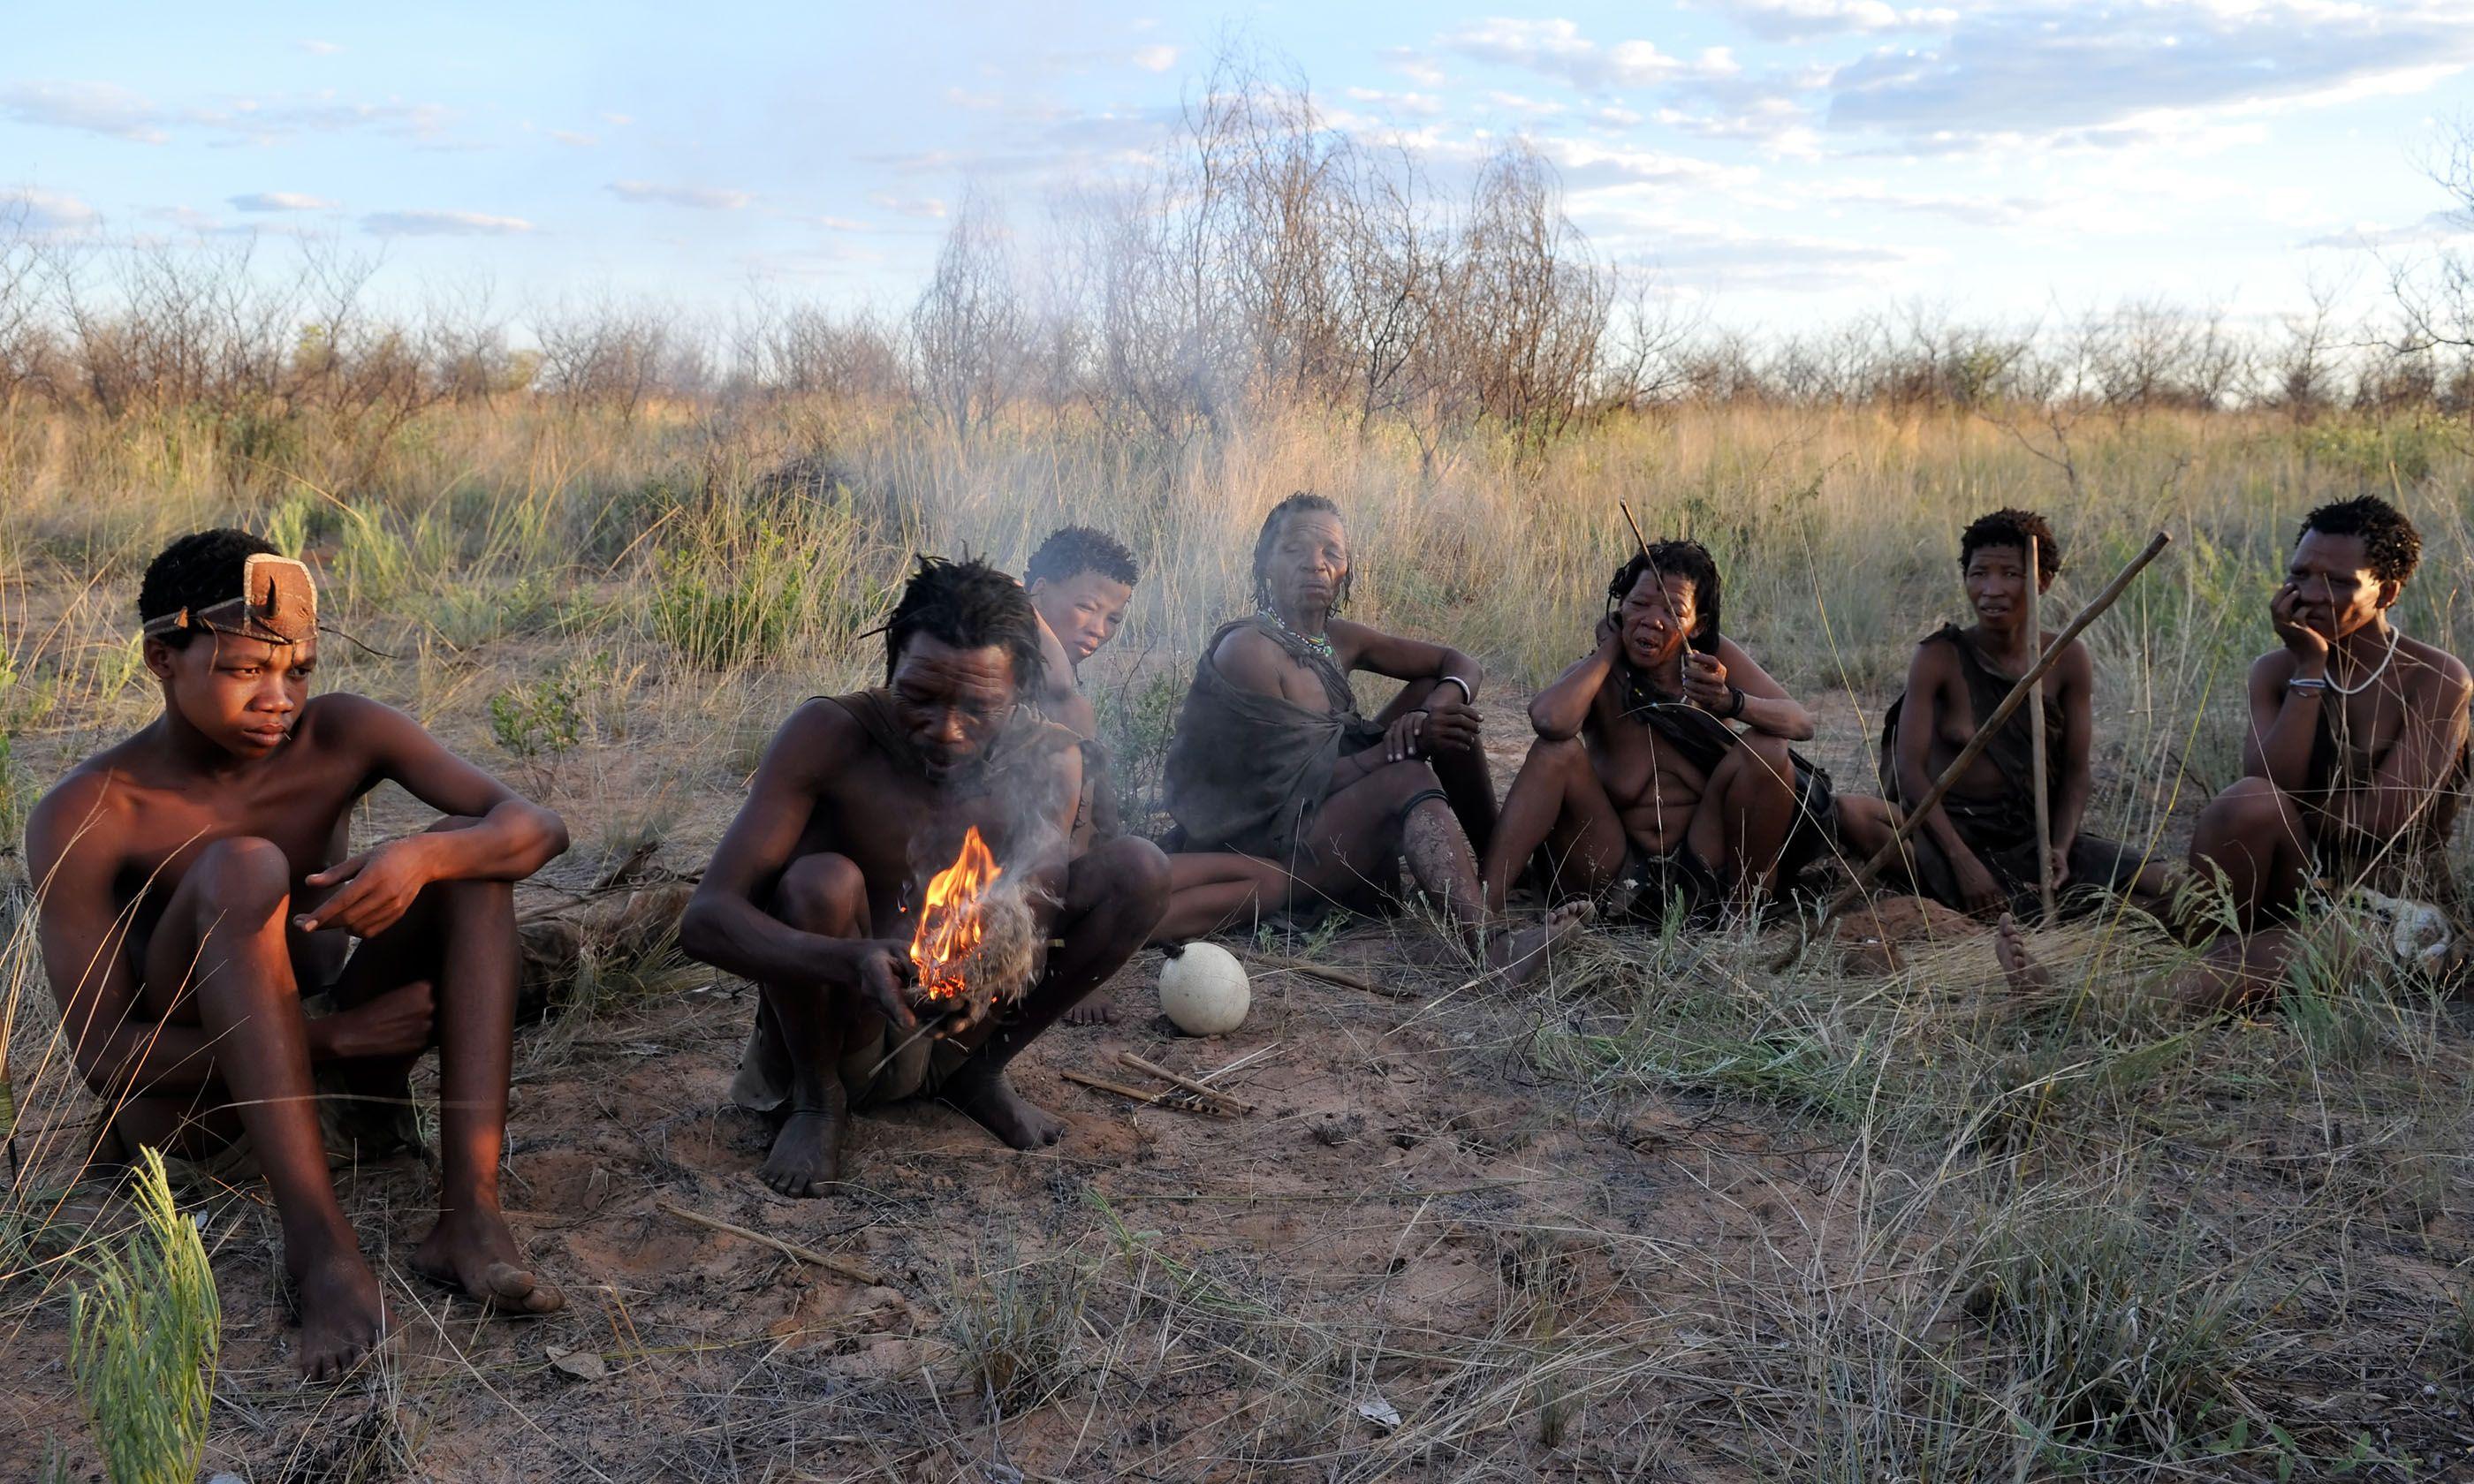 Kalahari bushmen in Botswana (Shutterstock.com)